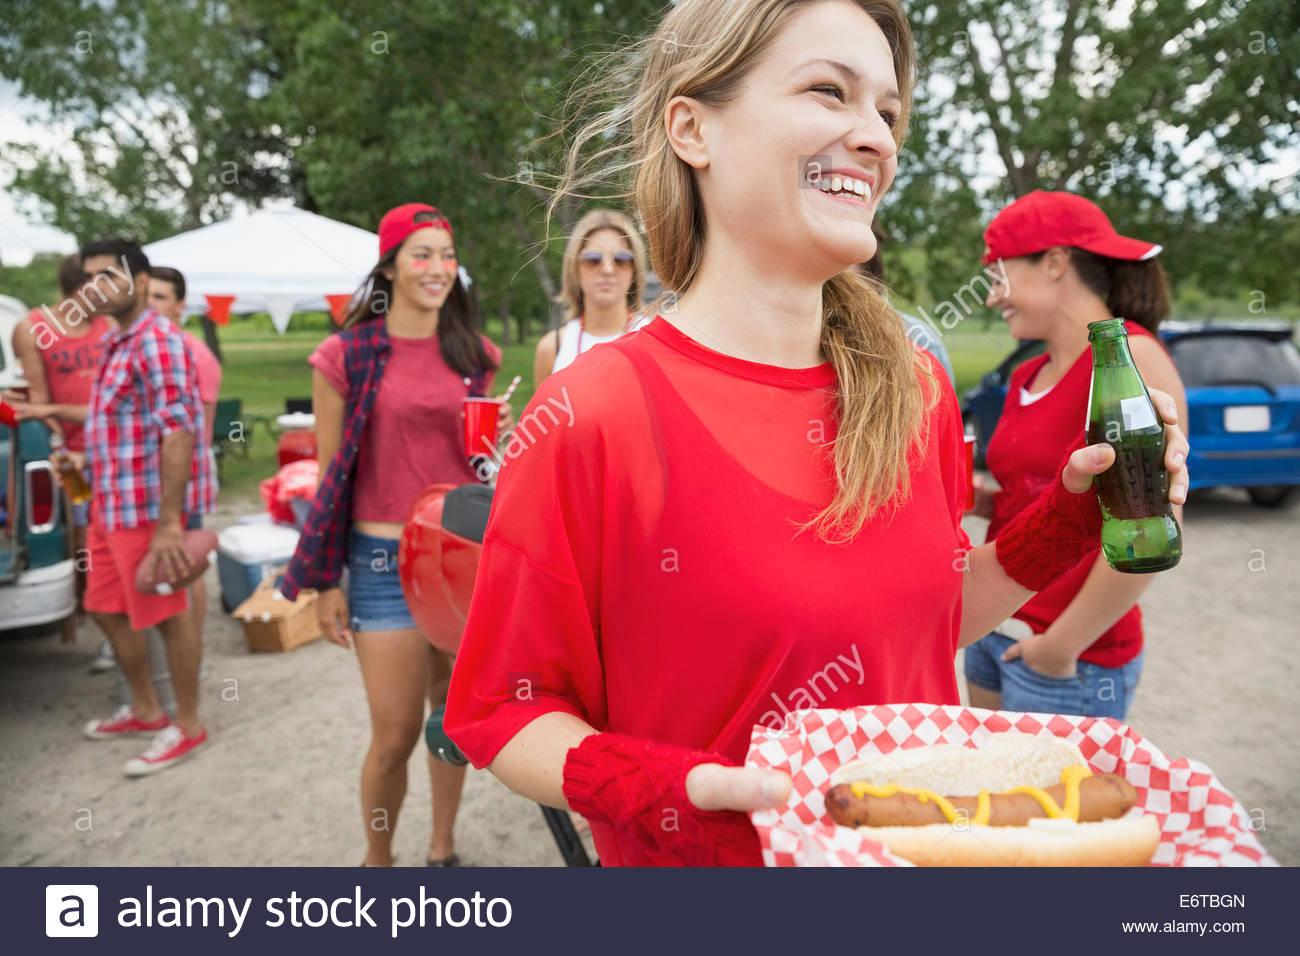 Frau Essen Hot Dog am Grill im Feld Stockbild